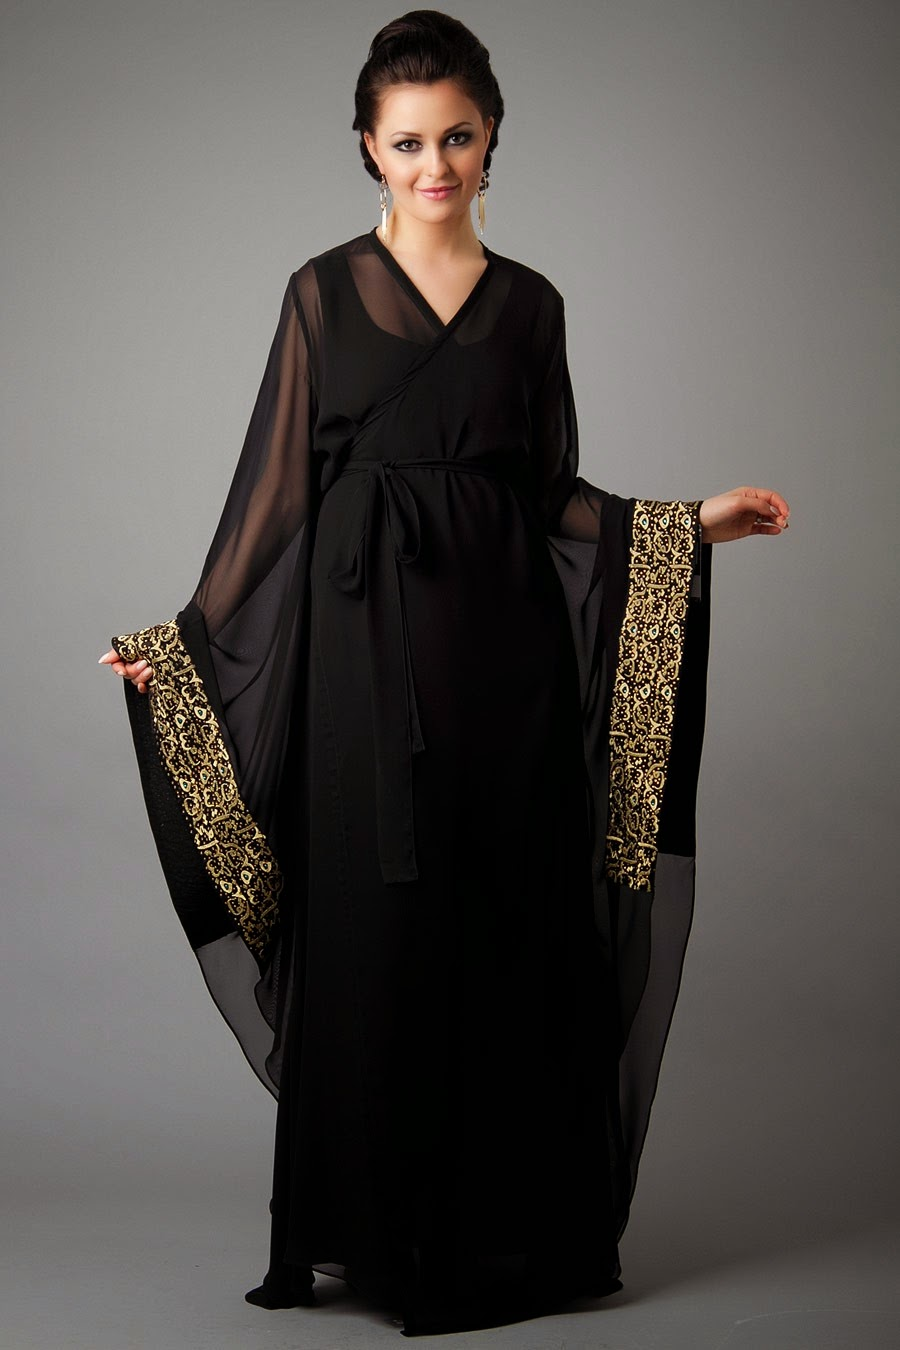 Histoire Abaya, Abaya, Abaya Emirat, abaya femme, abaya luxe, abaya marocaine, Abaya moderne, Abaya noir, djellabti.blogspot.com,